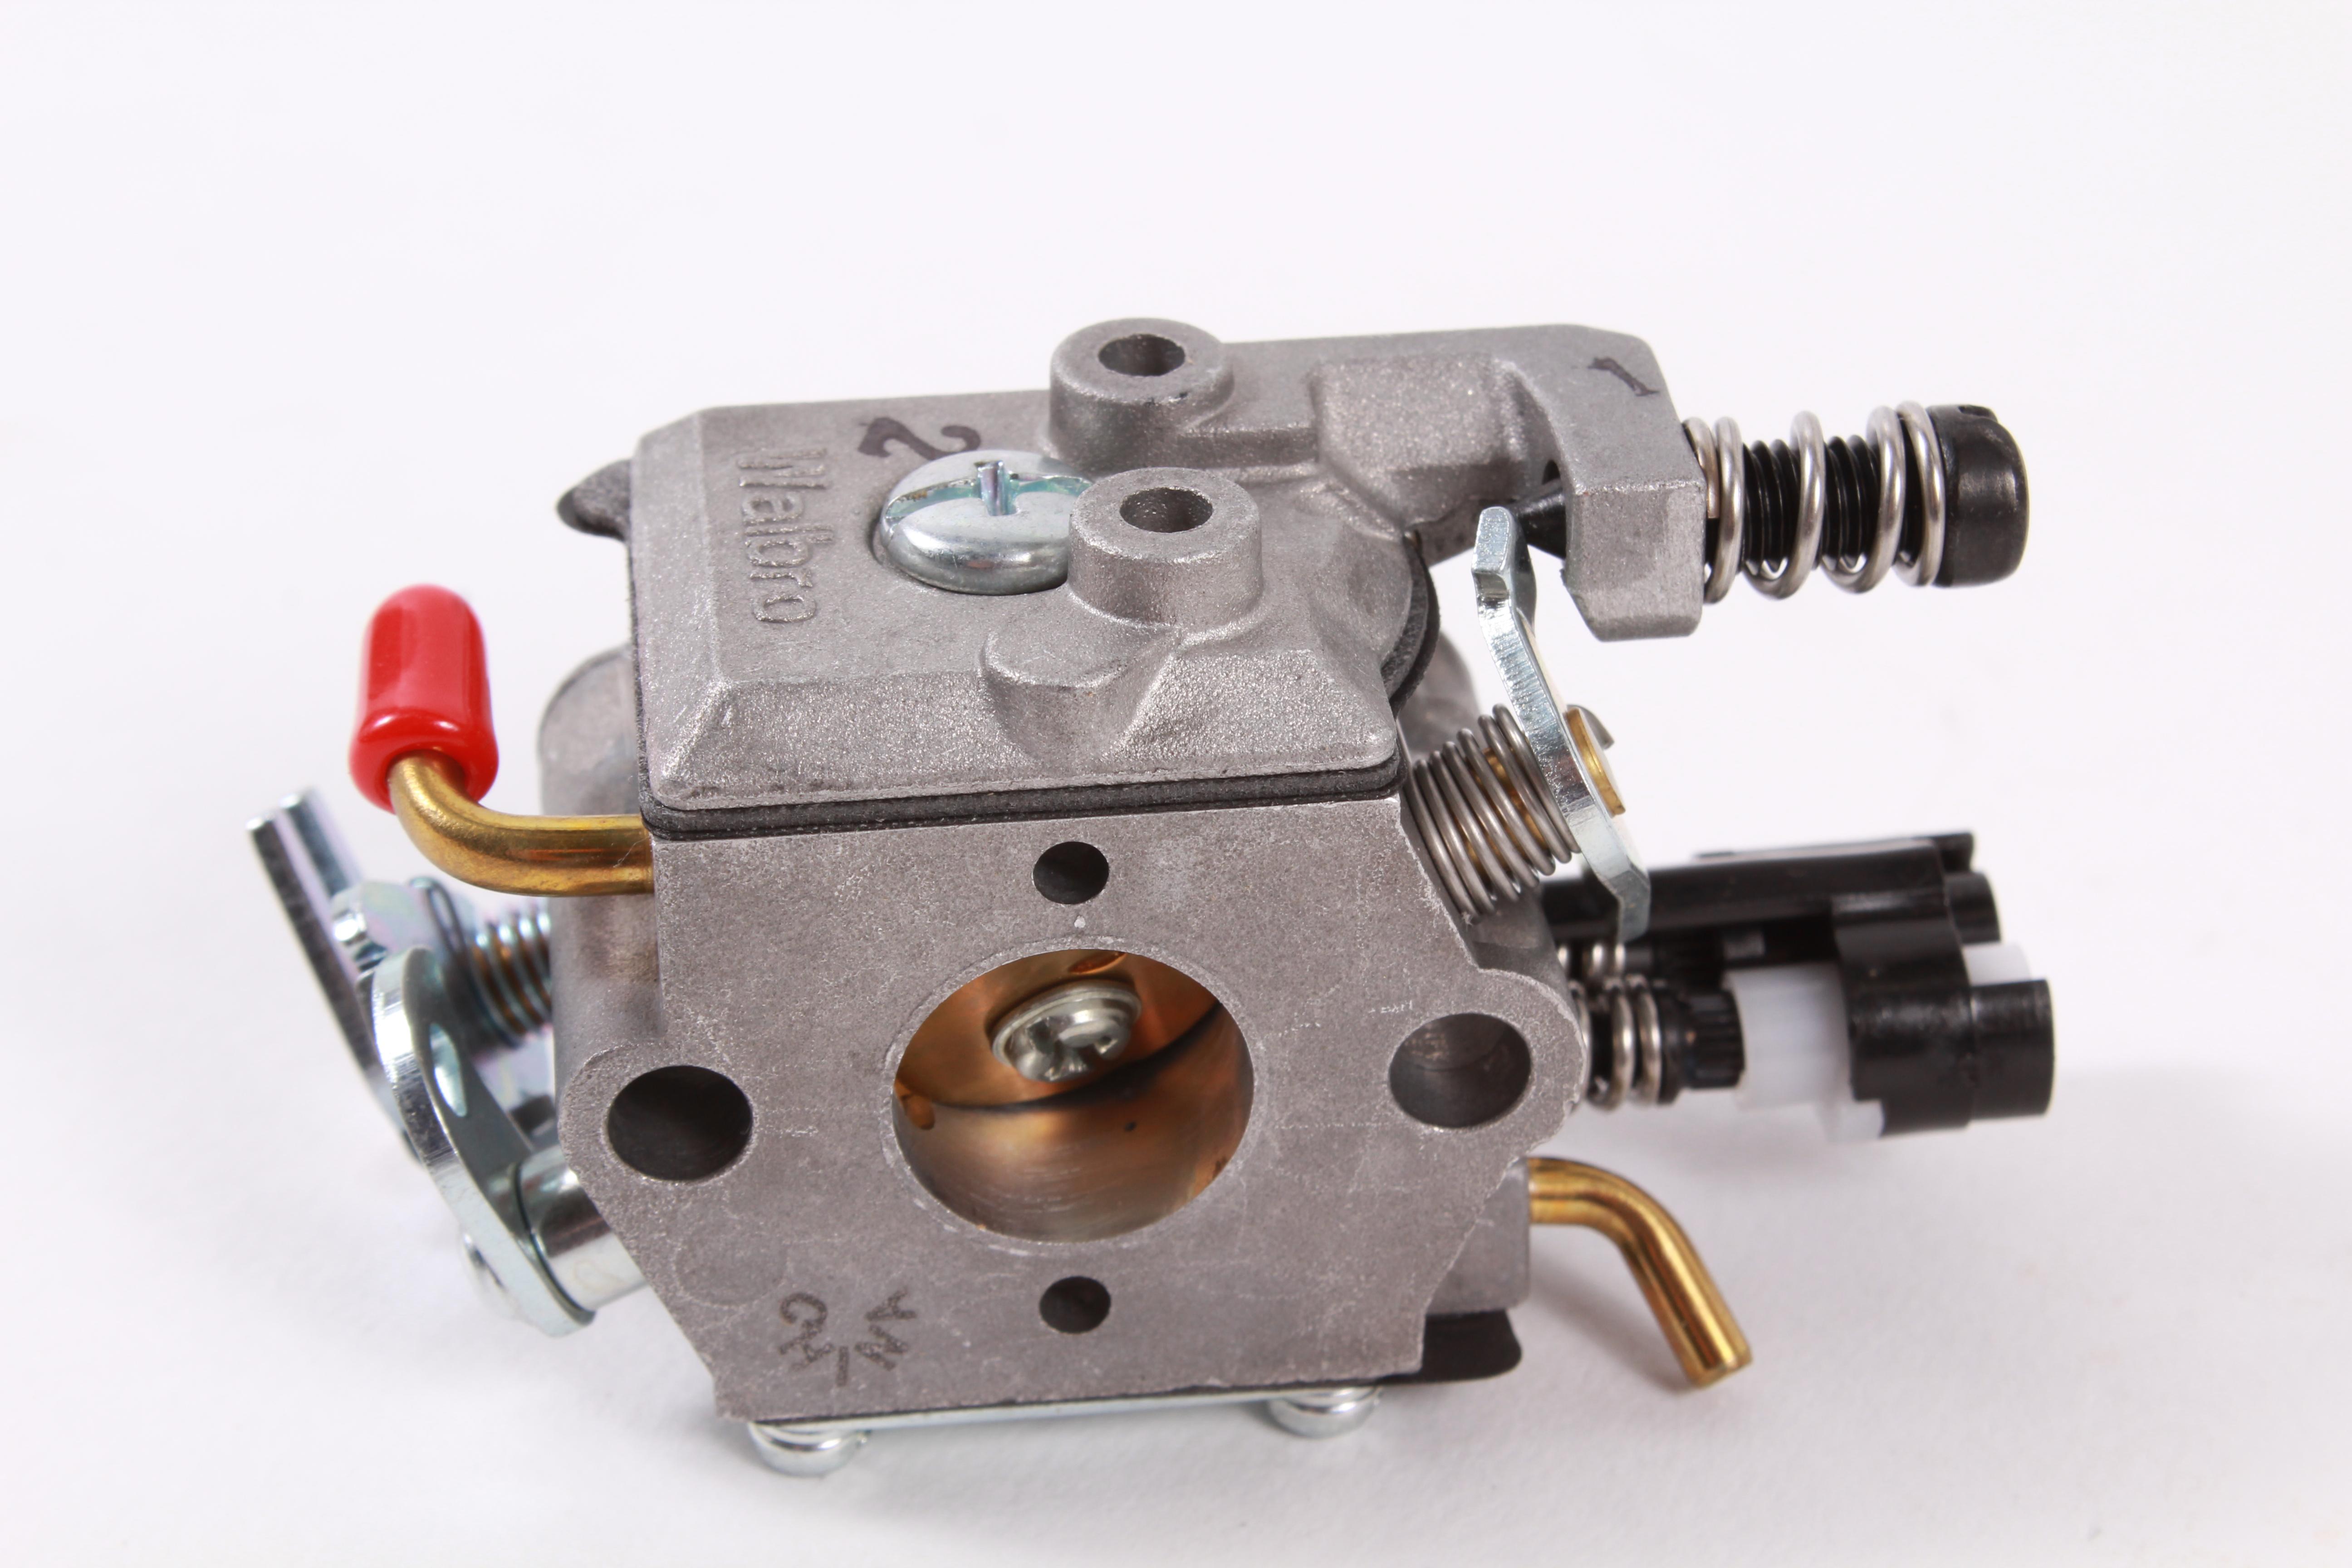 Genuine Husqvarna 577133001 Carburetor Assembly Yard, Garden & Outdoor Living Lawn Mower Parts & Accessories